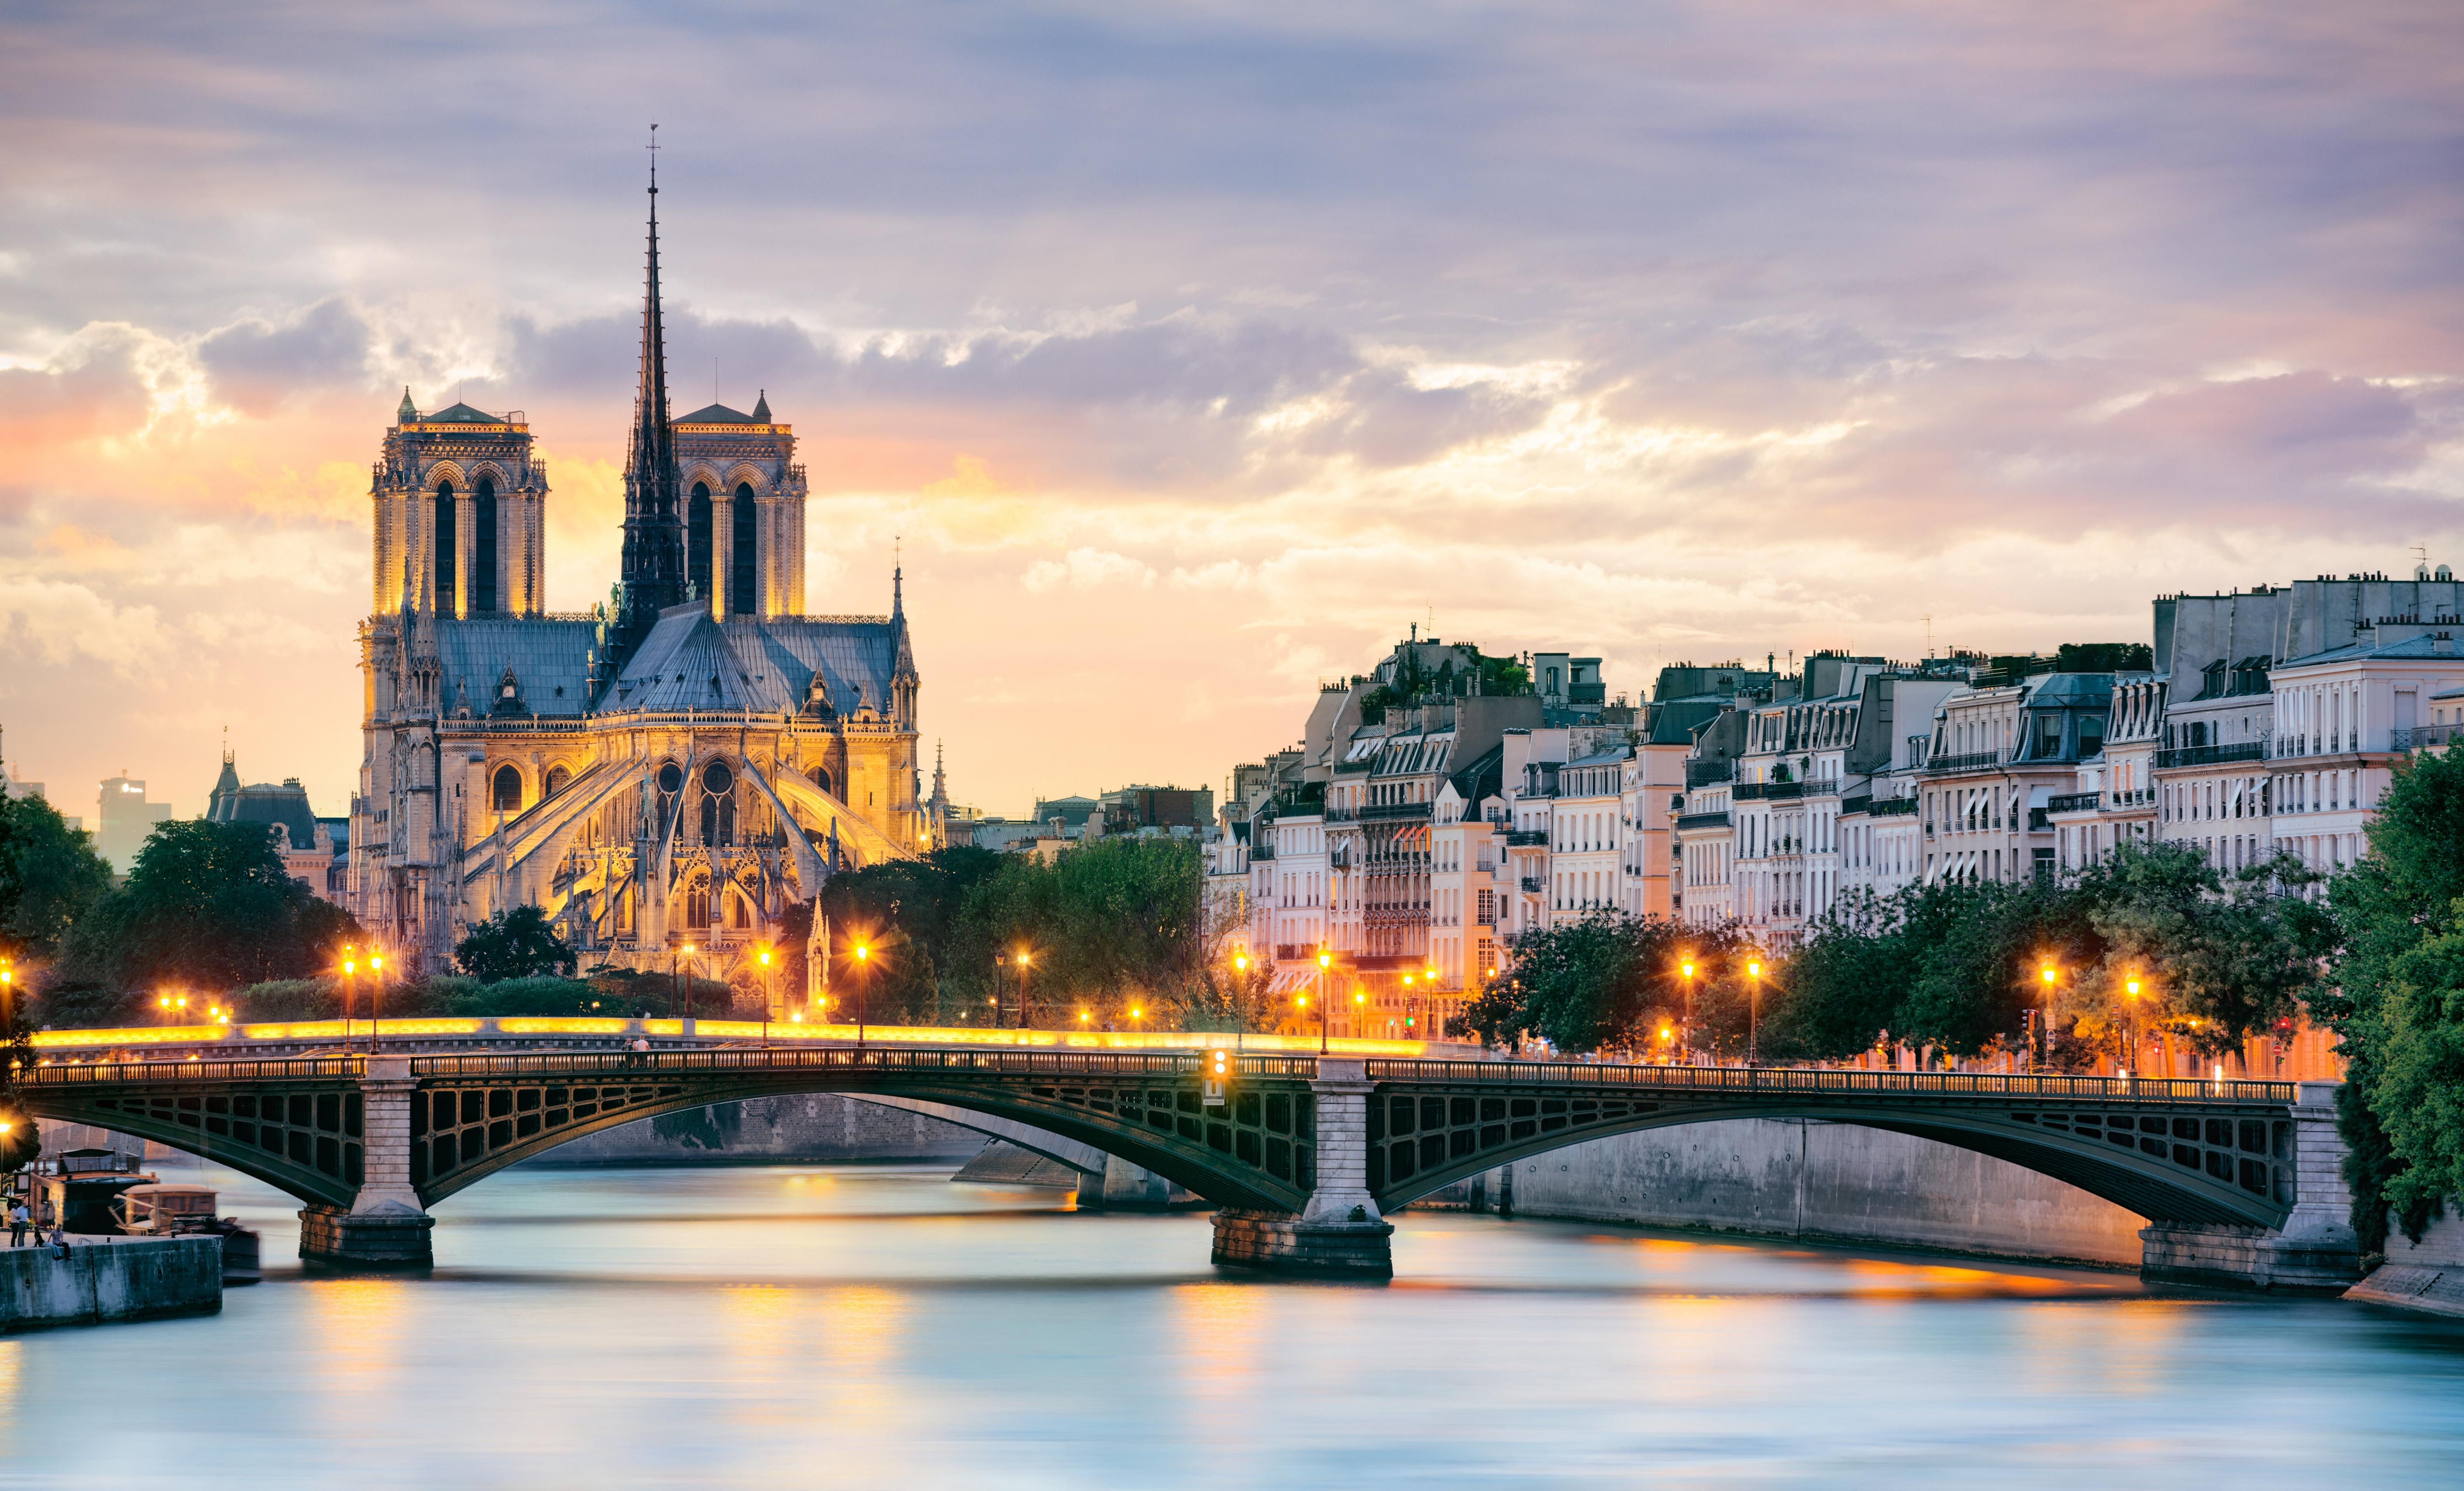 Destination image of Paris